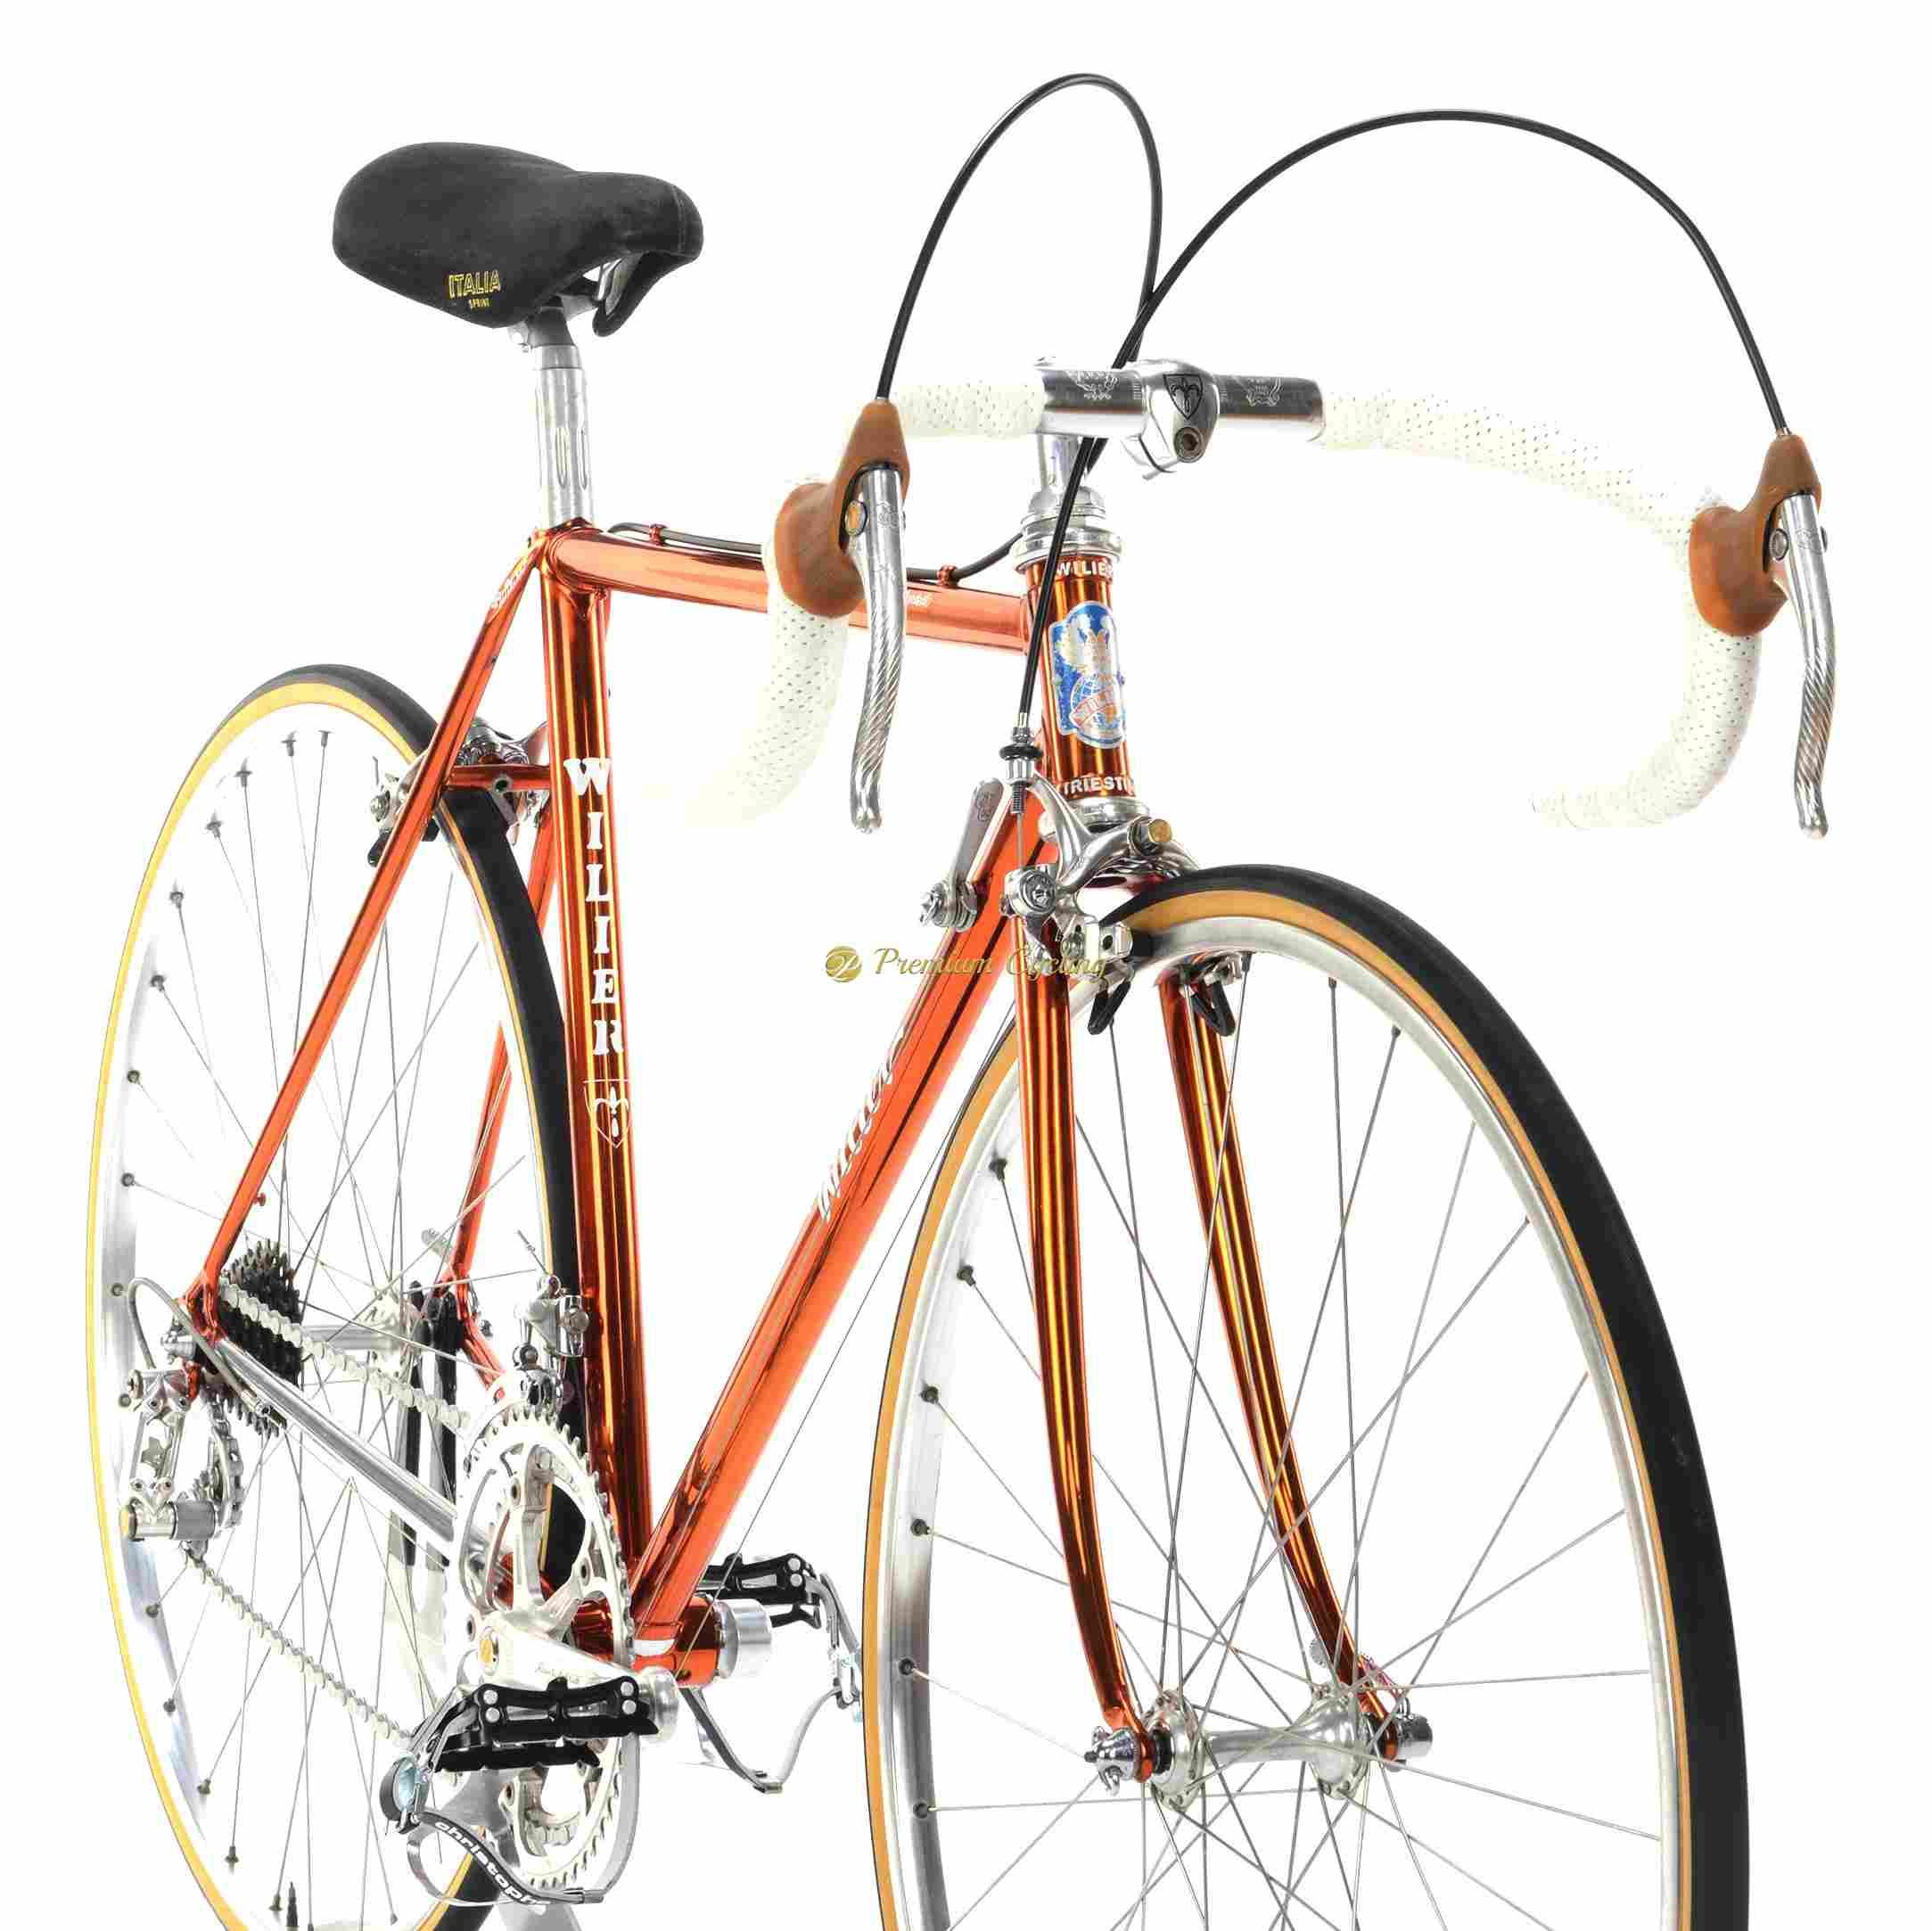 f1453c5bd15 WILIER Superleggera Ramata SL 1982, Campagnolo 50th Anniversary, Eroica vintage  steel collectible bike